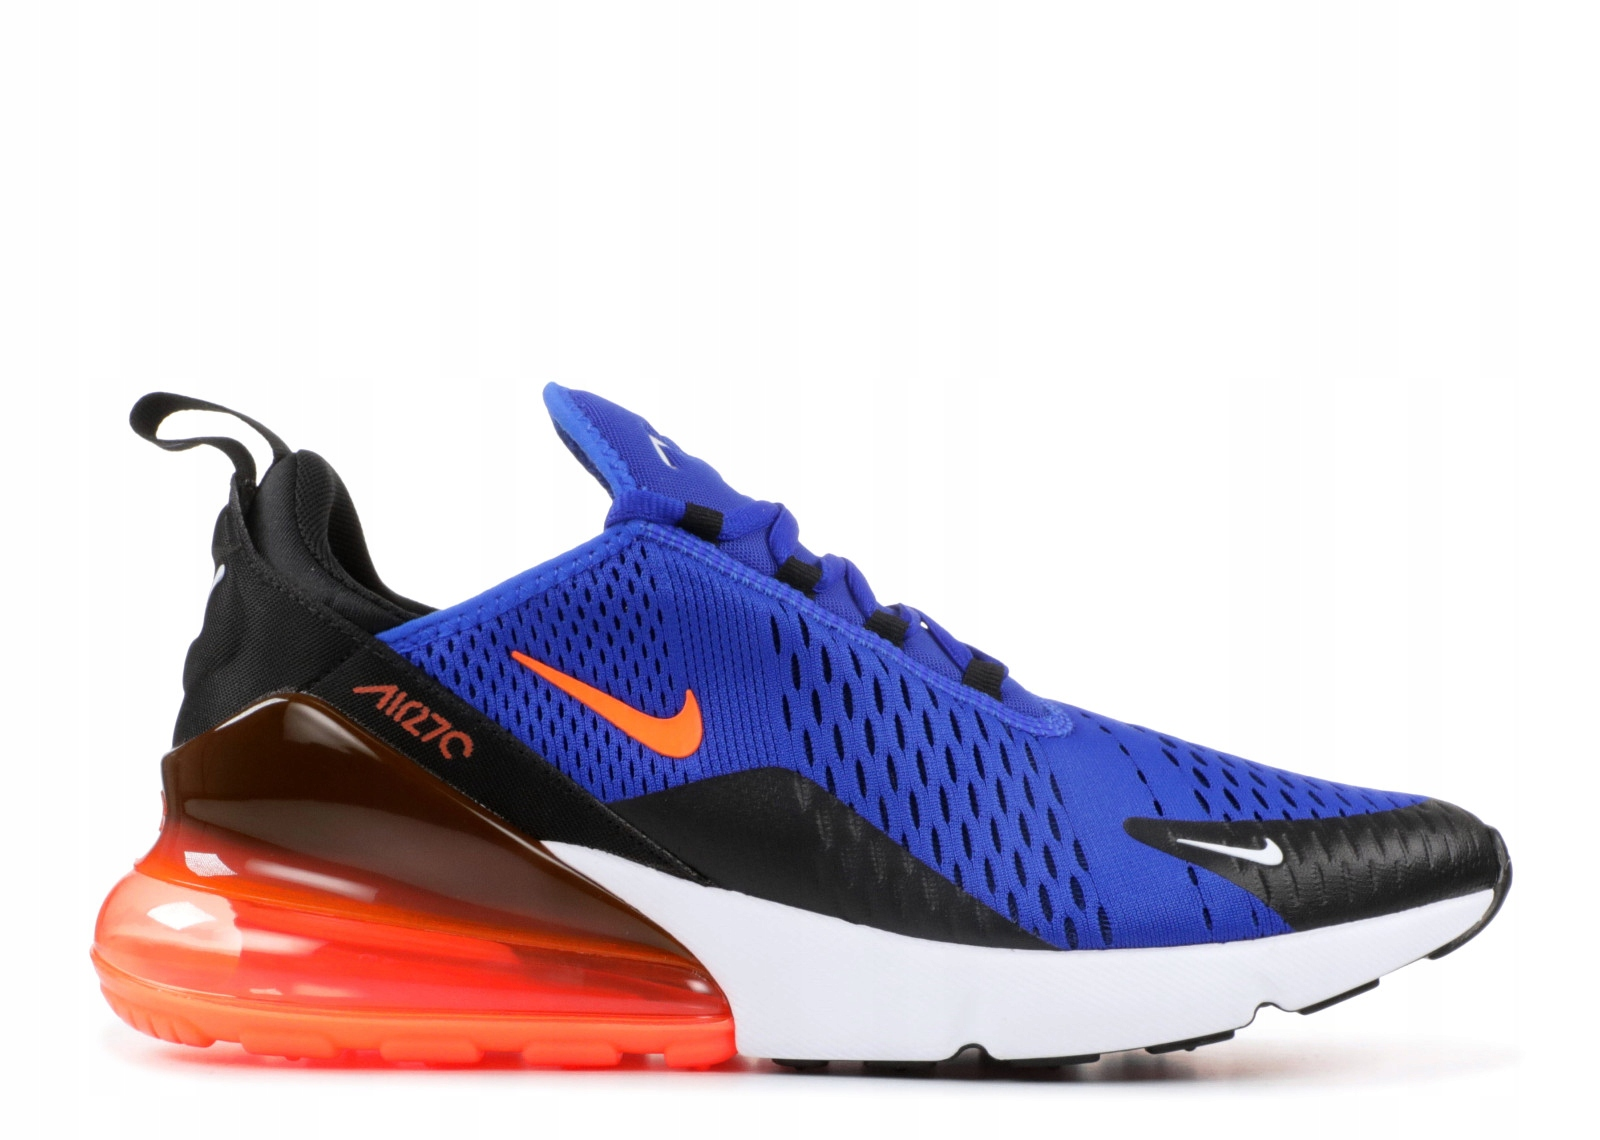 Buty Nike Air max 270 GRANATOWE *NOWO??* r.40